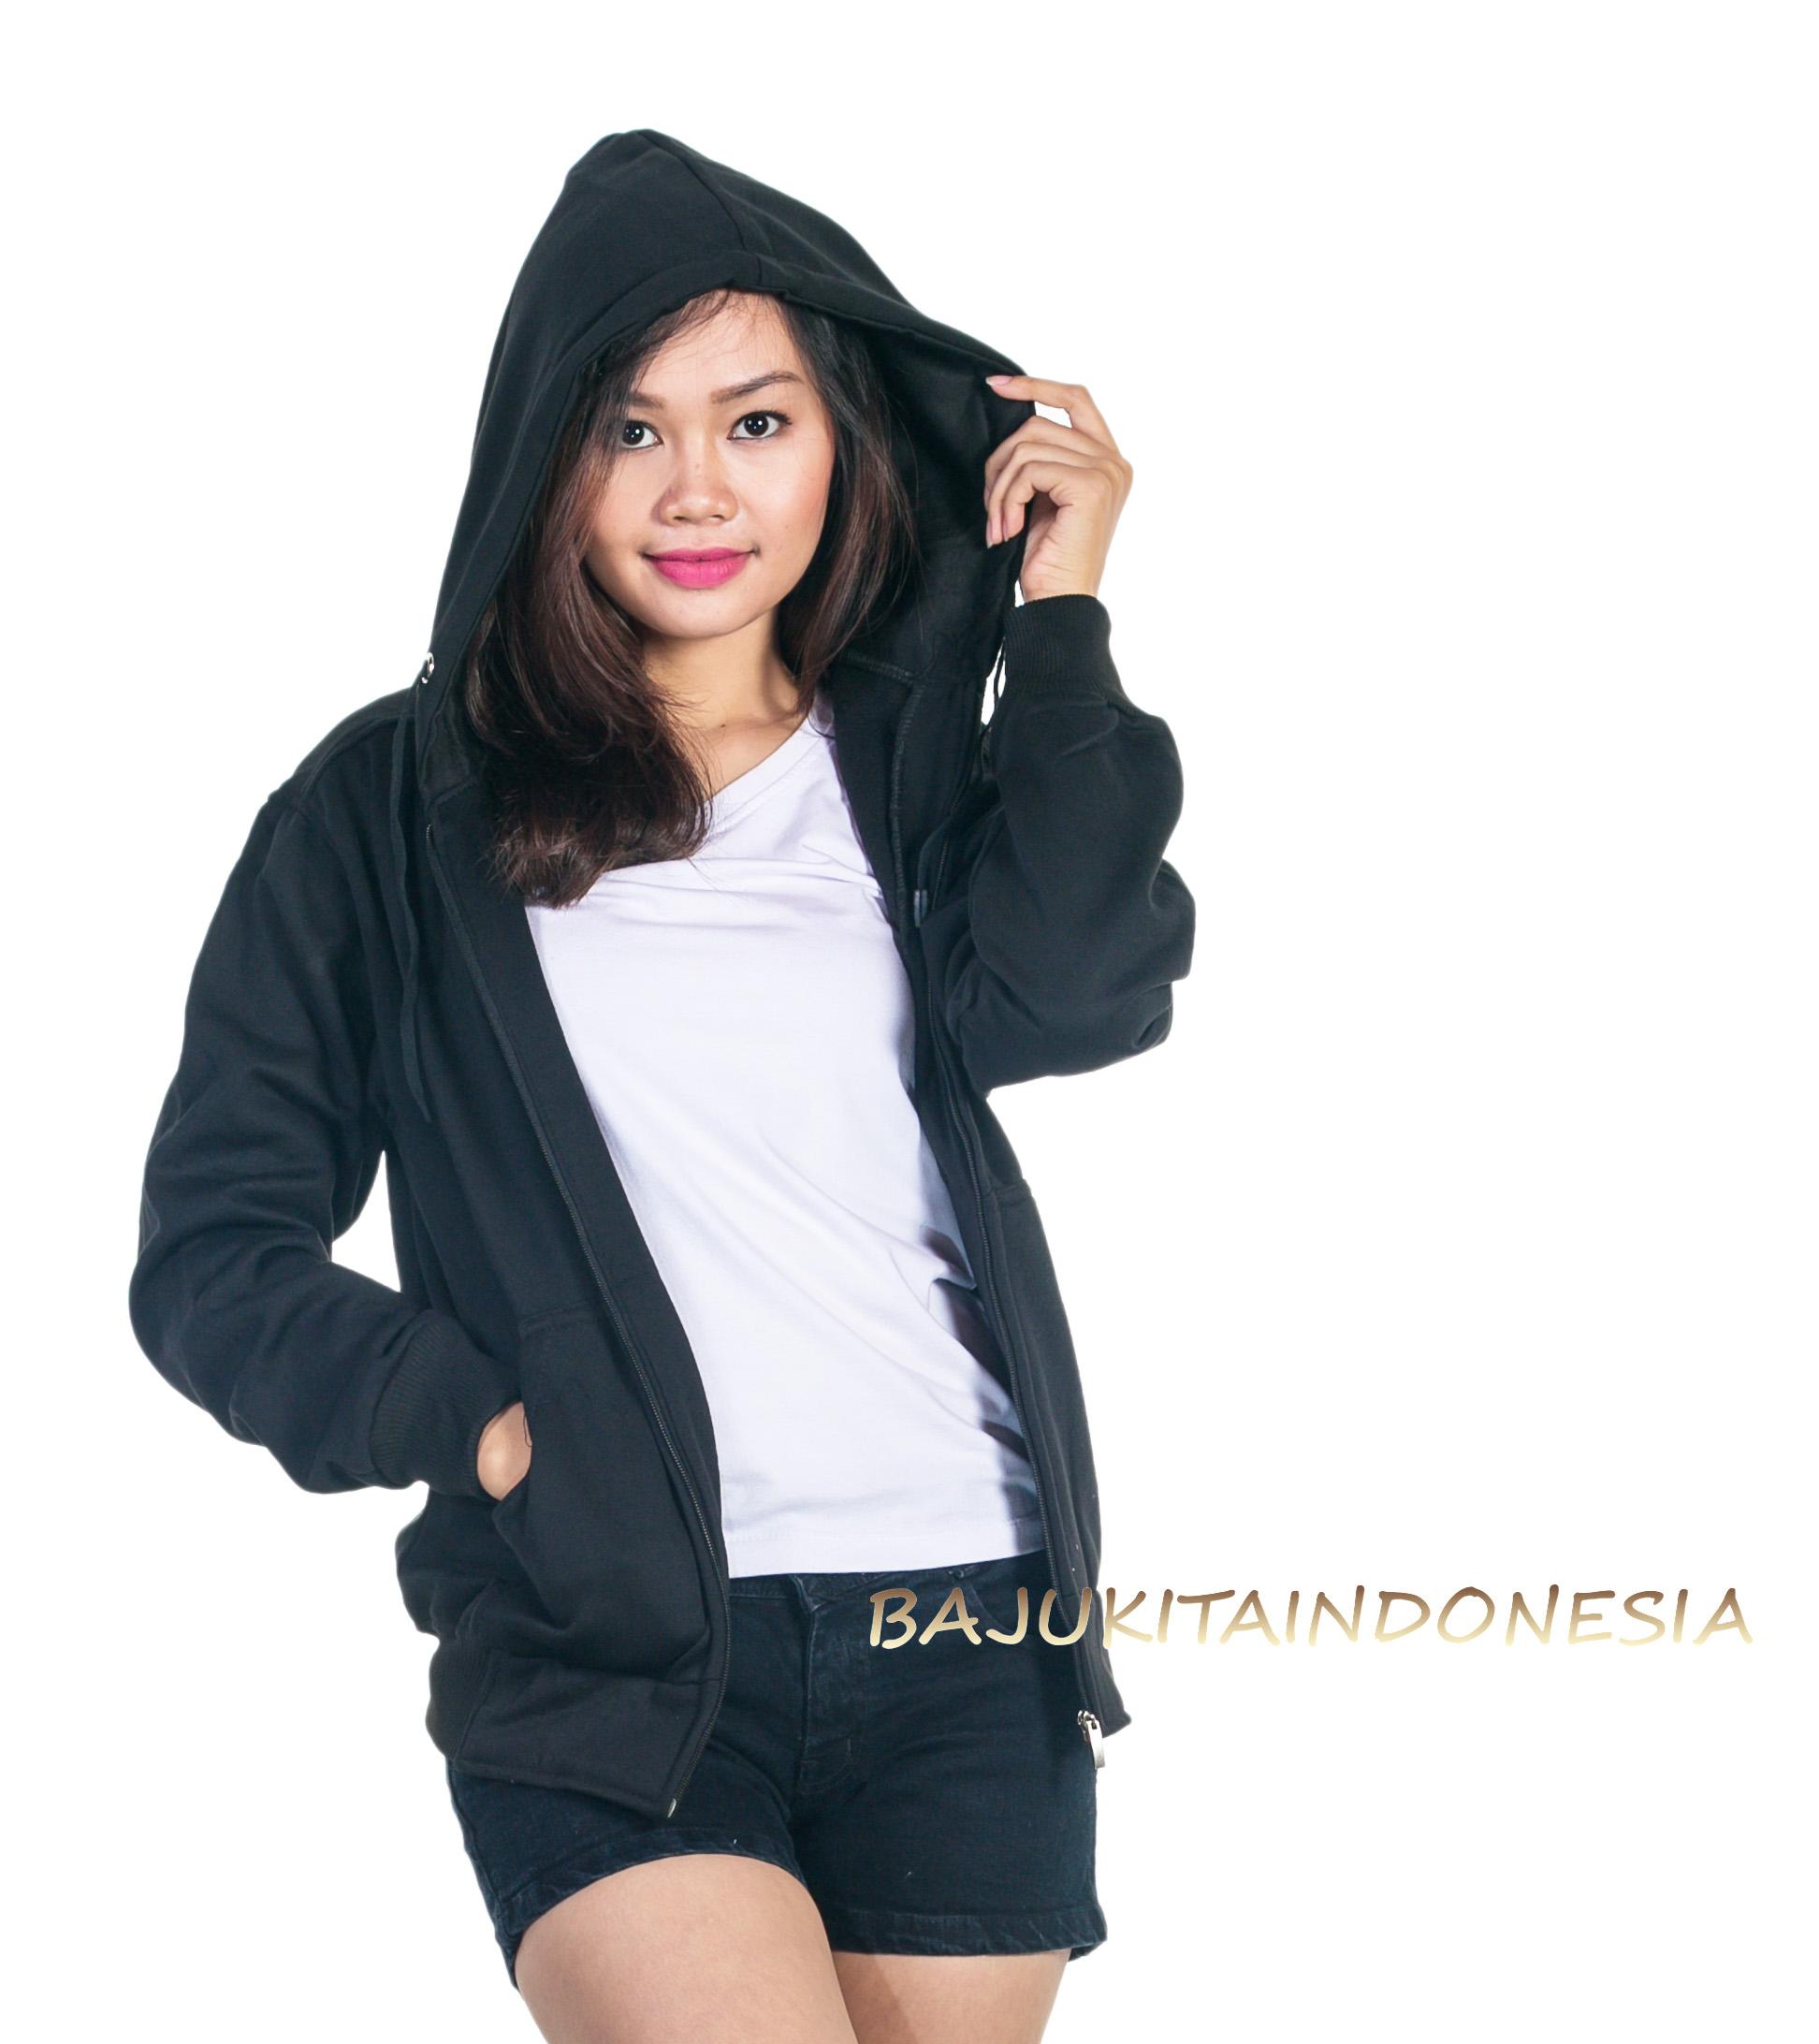 Bajukitaindonesia Jaket Hoodie Jumper Polos Merahmaroon M Xl Source · Jual JAKET HOODIE ZIPPER HITAM WANITA DAN PRIA M XL Novalia Shop